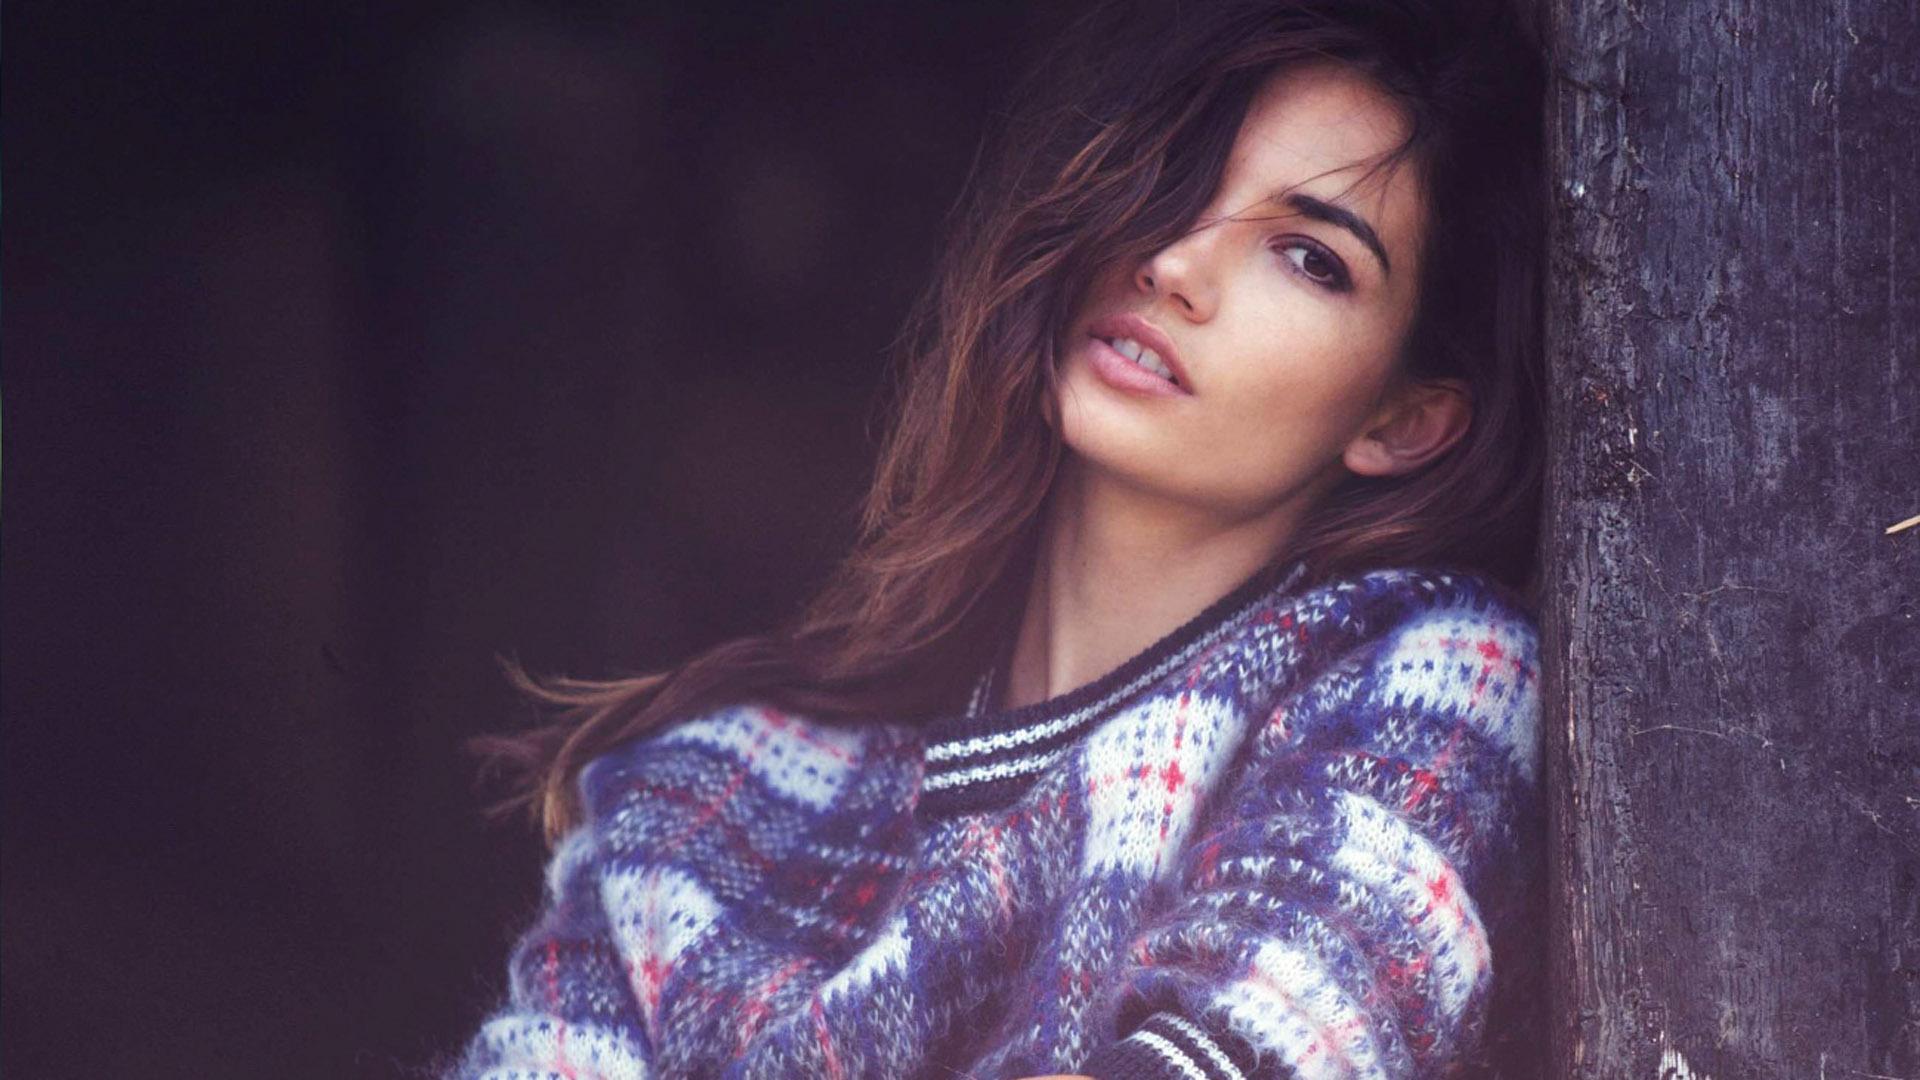 lily aldridge sweater wallpaper 66707